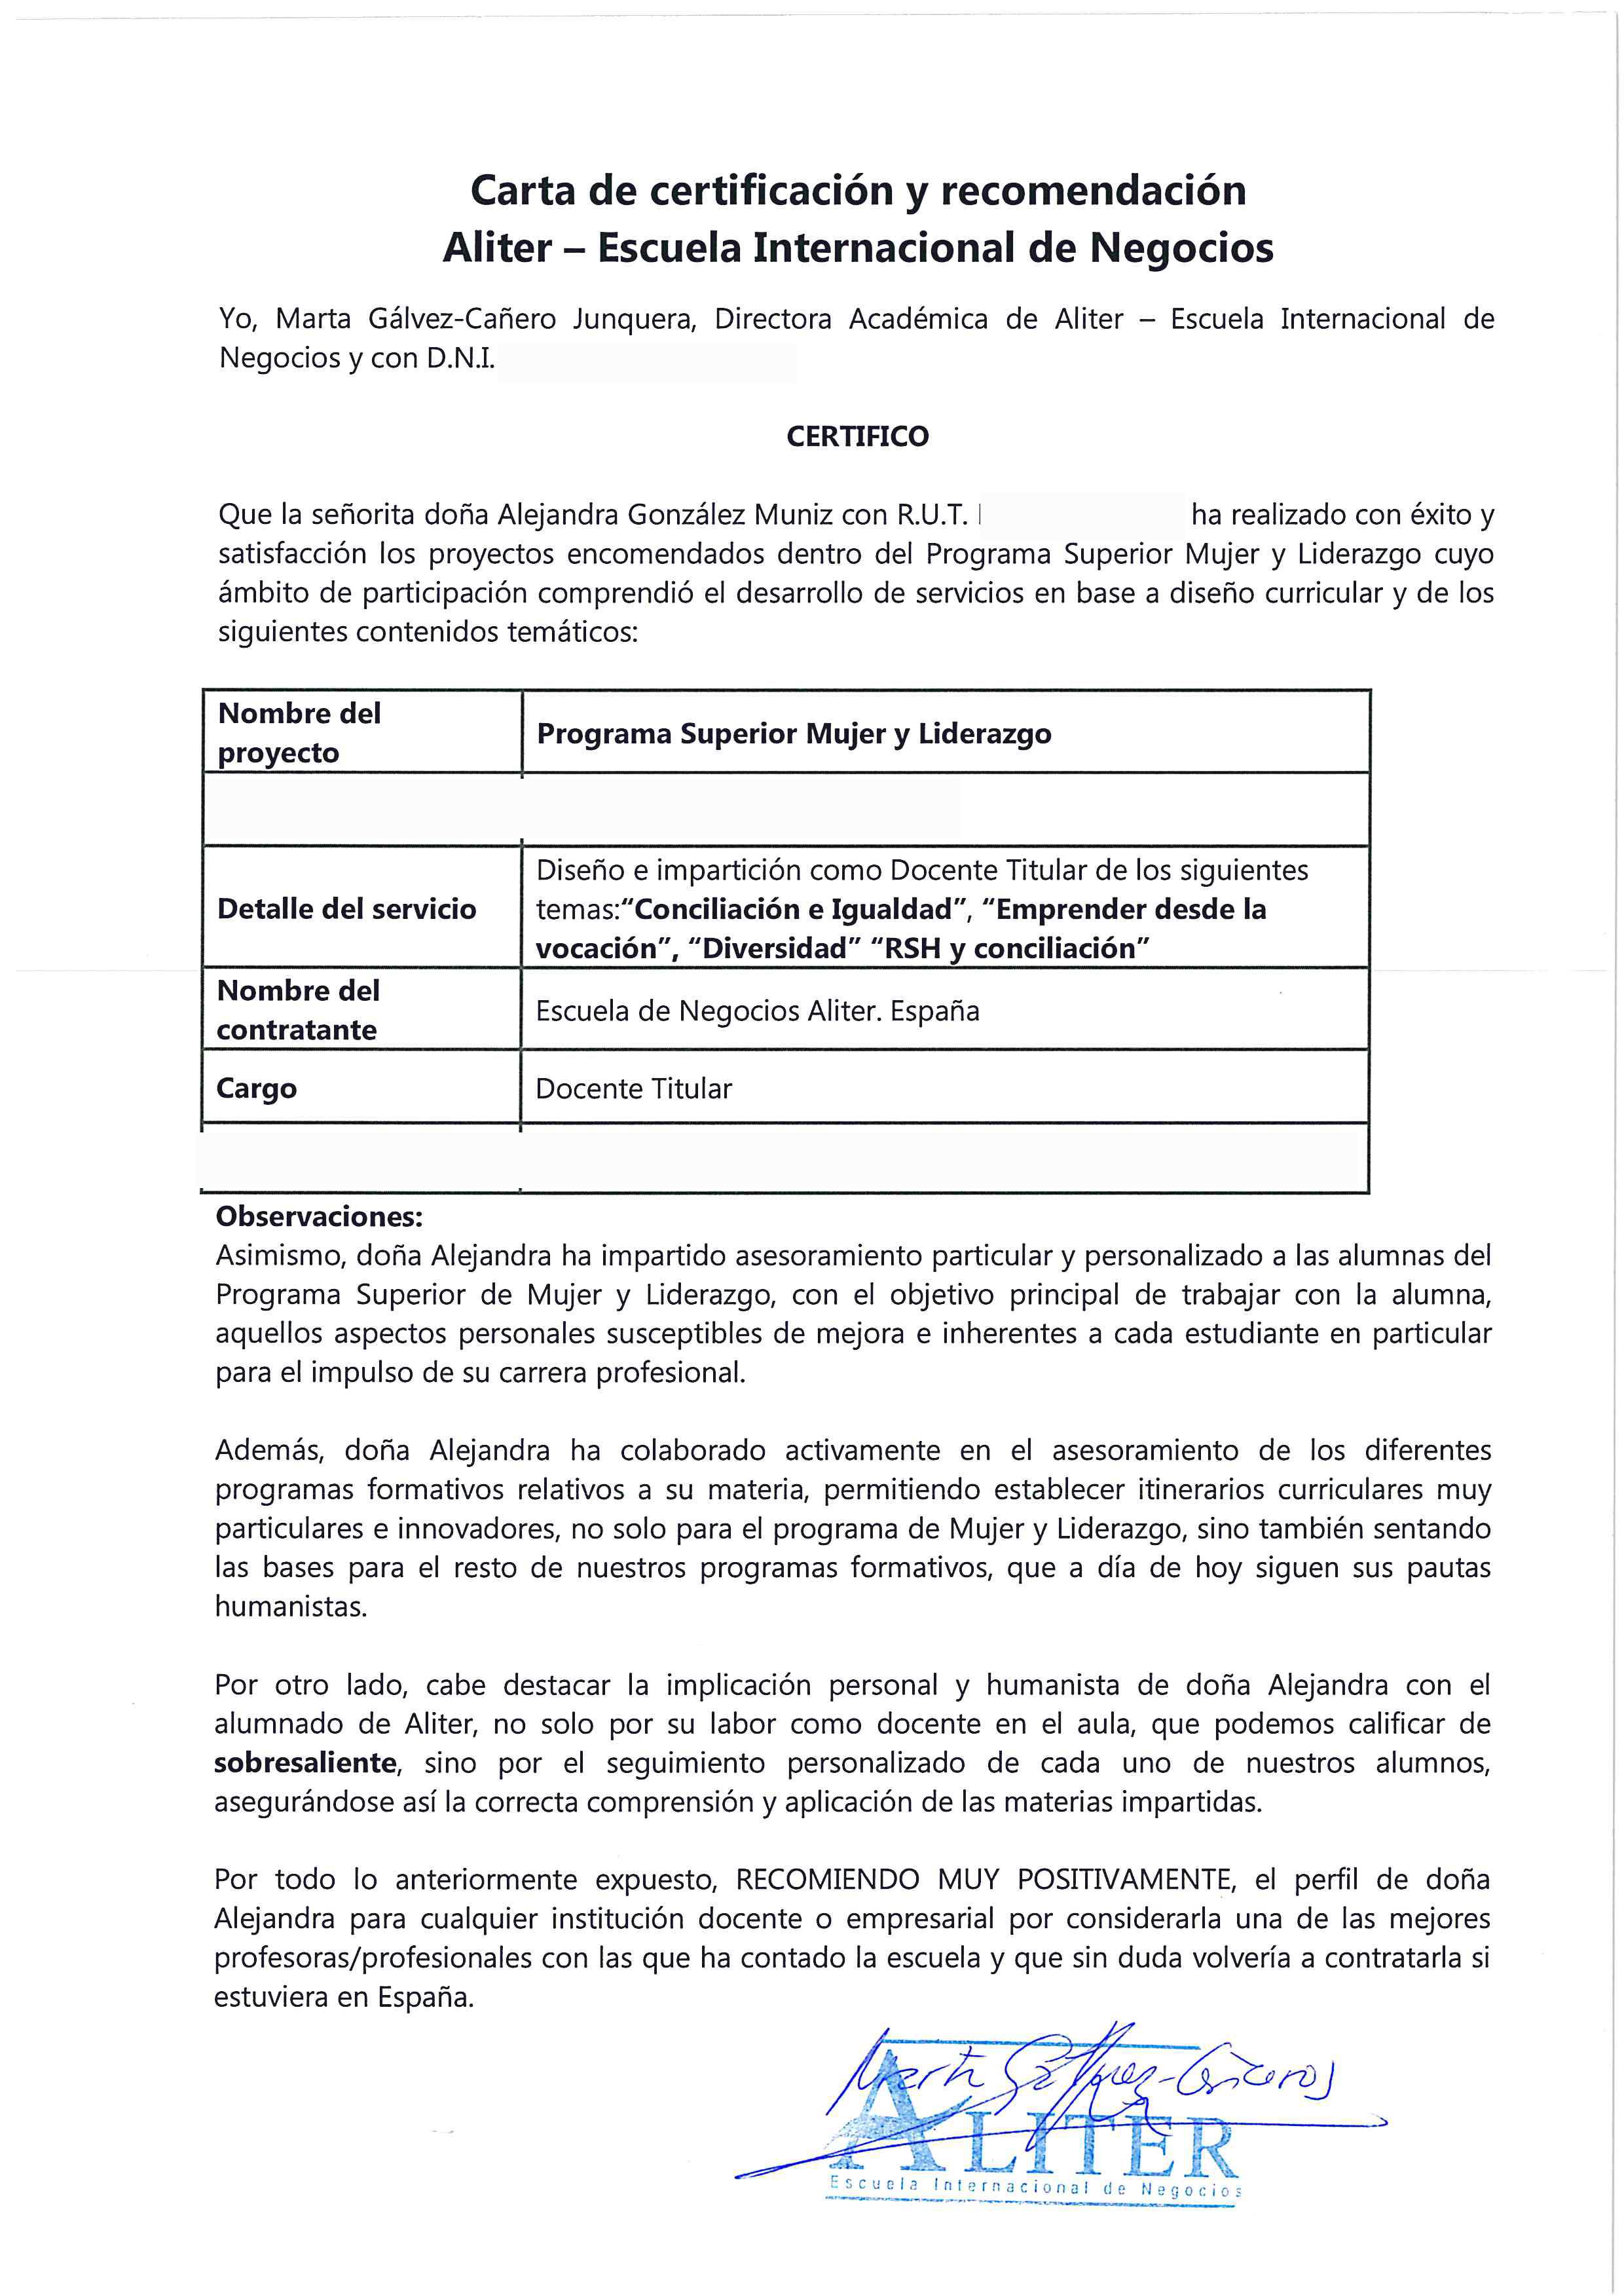 Carta de certificación yrecomendación aliter.jpg